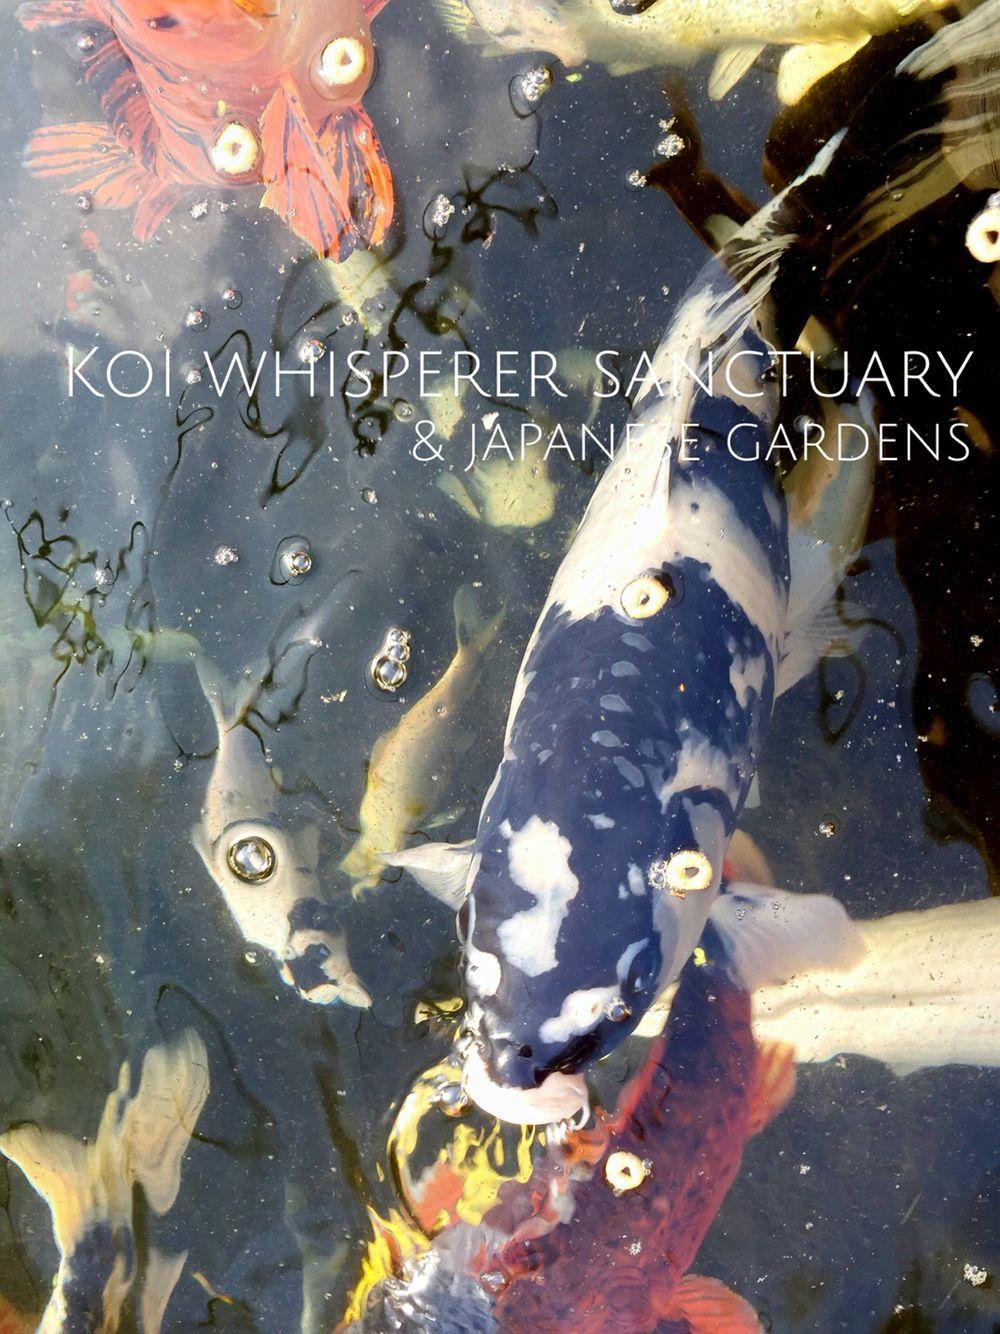 8a26bbf9f33d9c4aa8c424429e998495 - The Koi Whisperer Sanctuary & Japanese Gardens